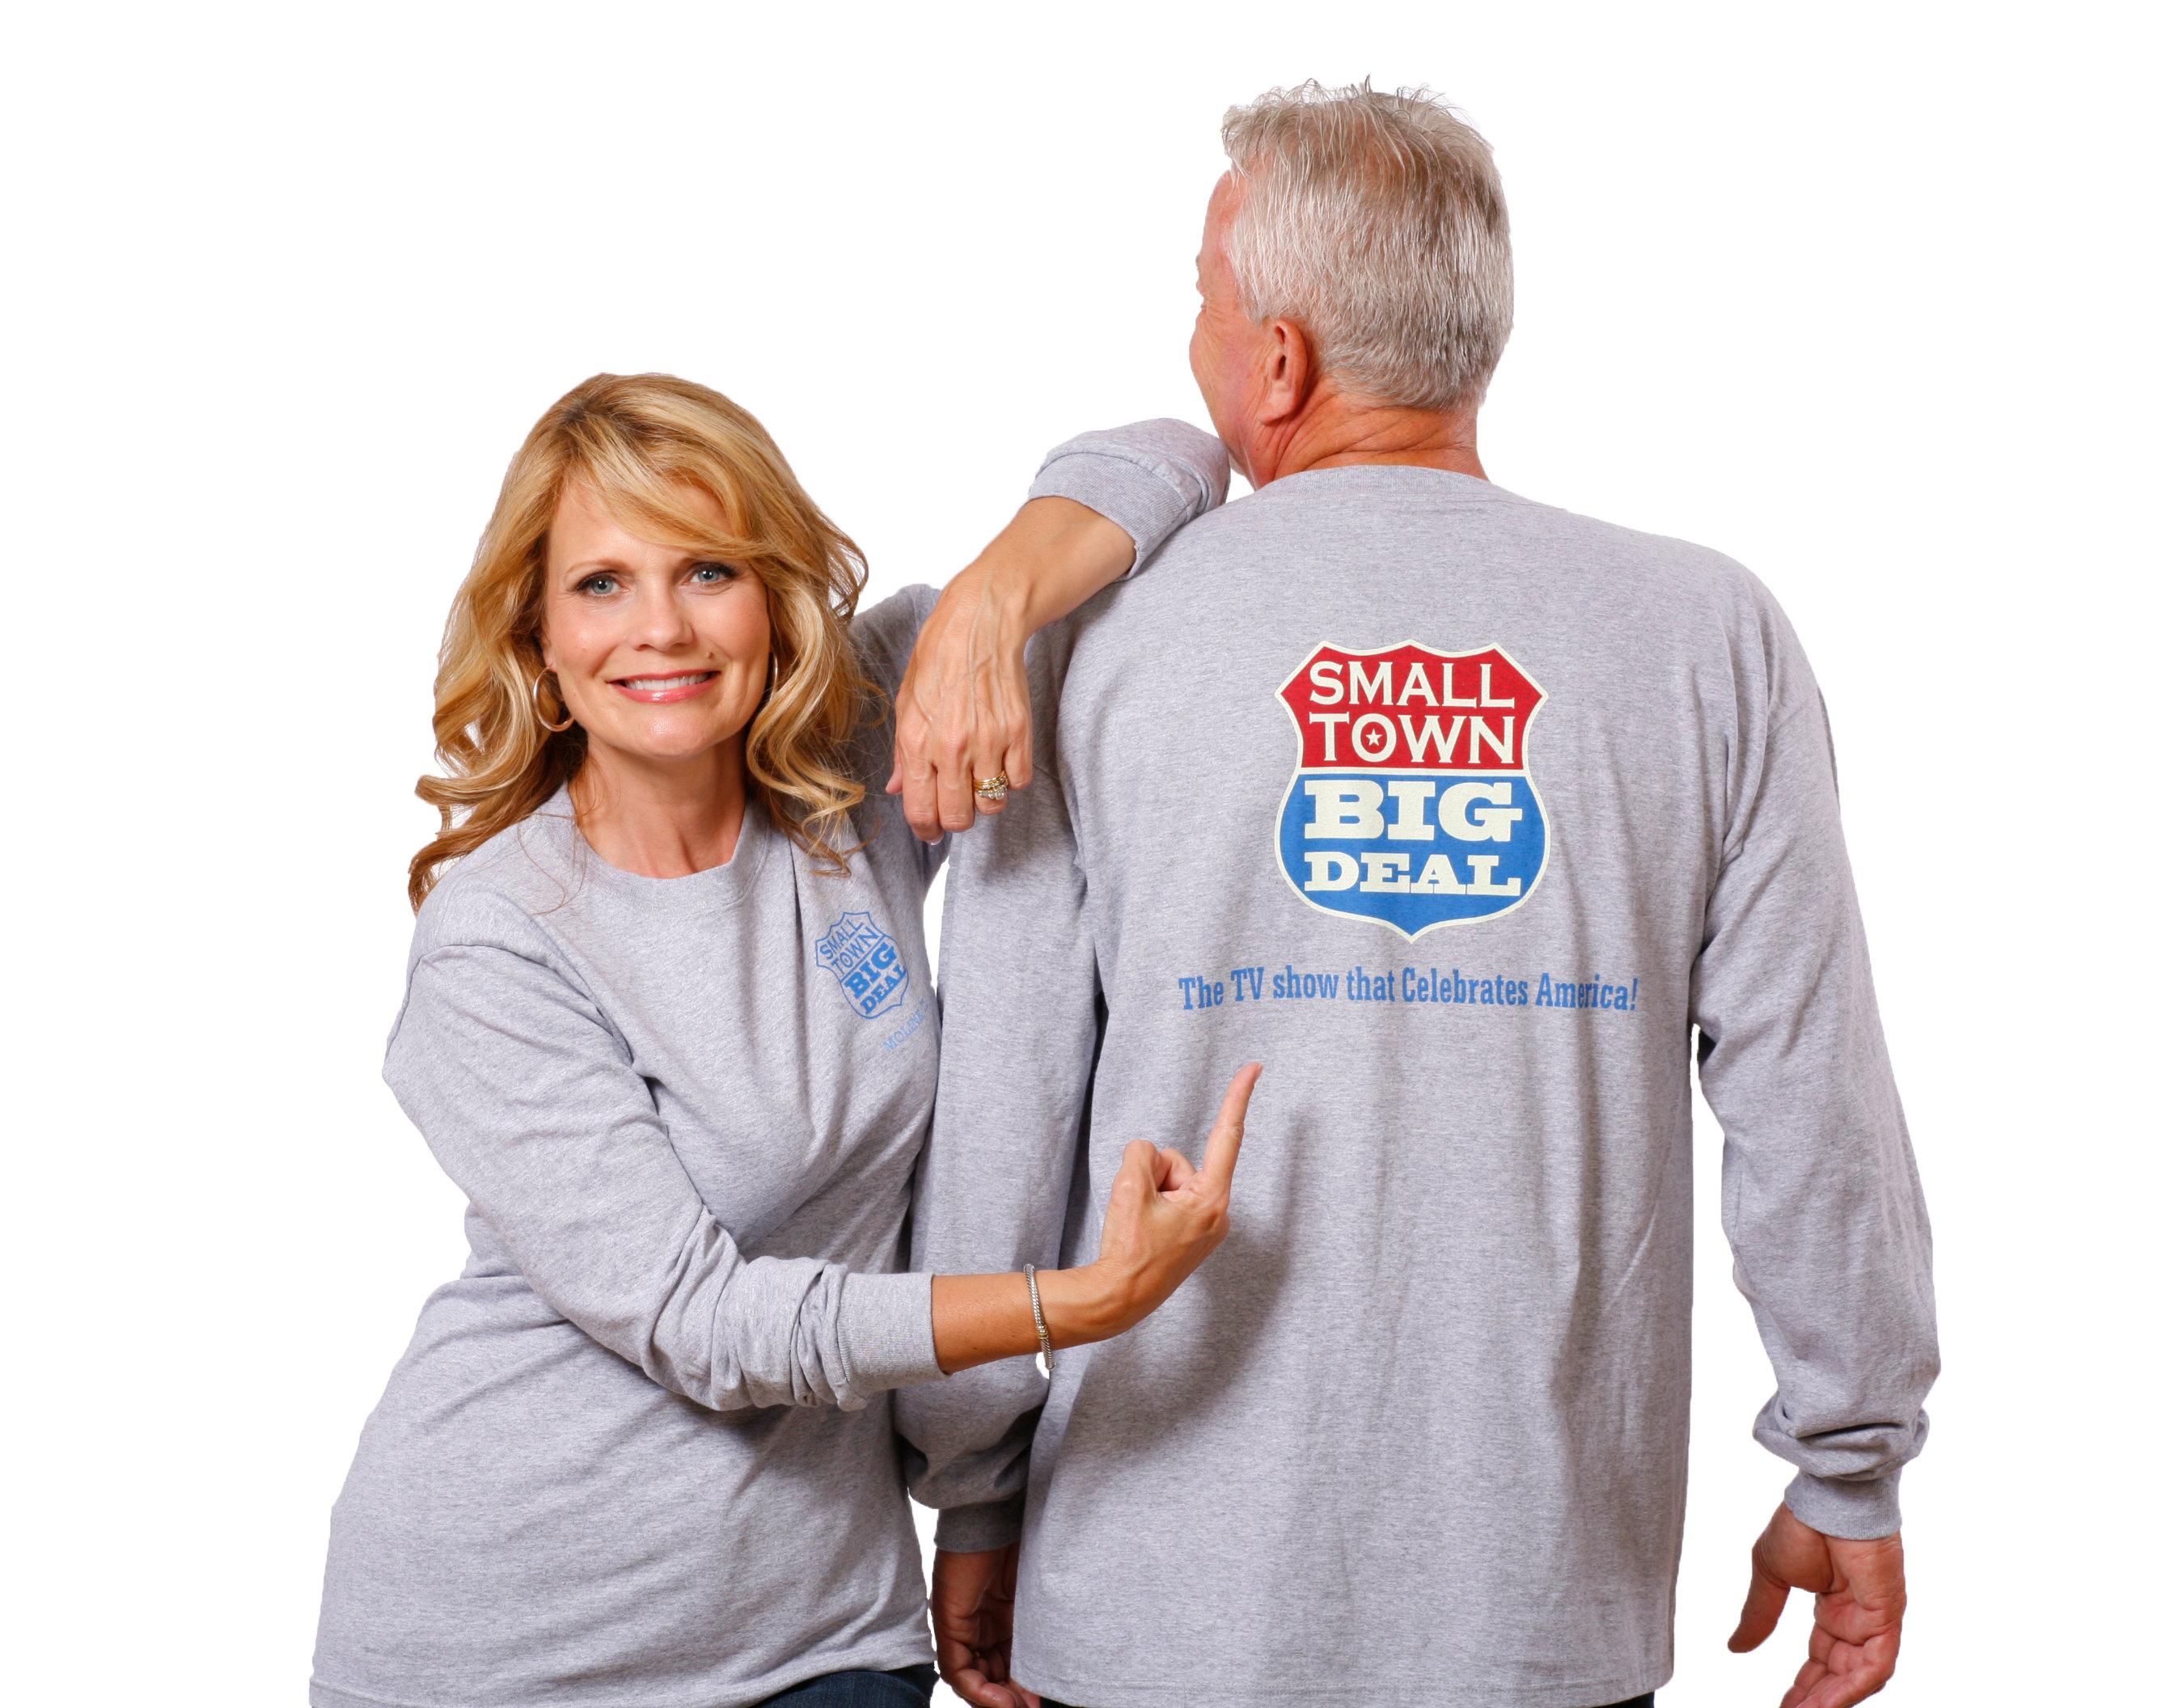 100% Cotton USA made Long Sleeve Tee Shirt